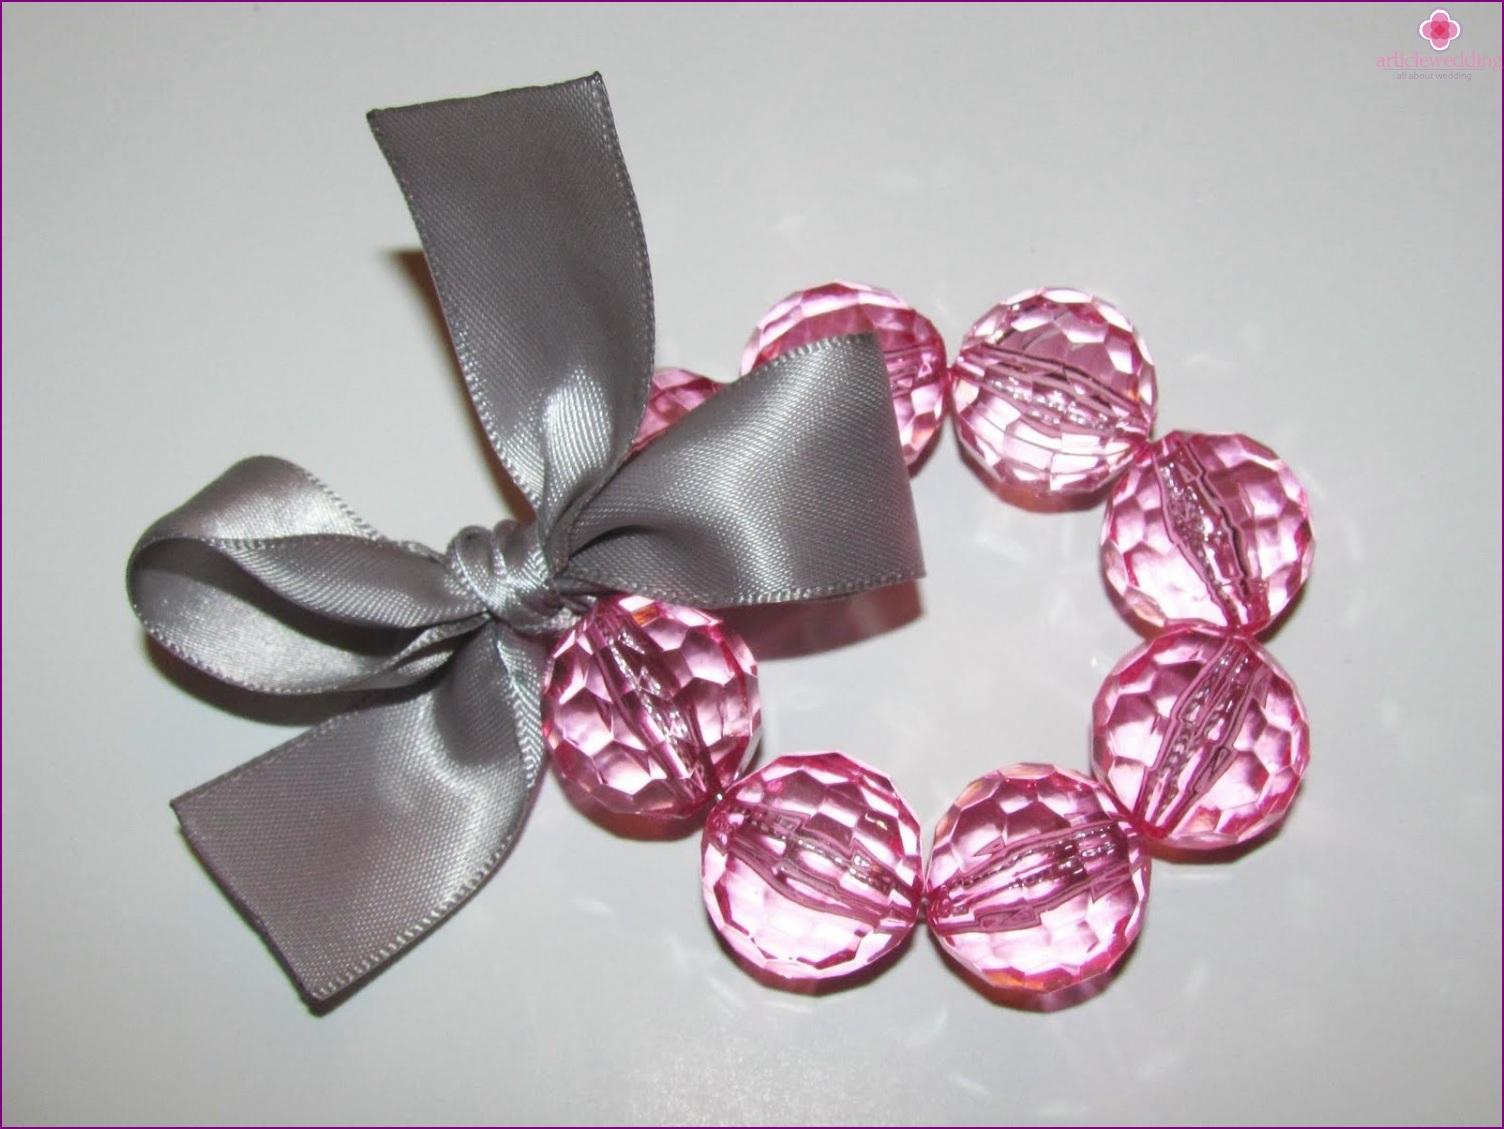 Bracelet with transparent beads